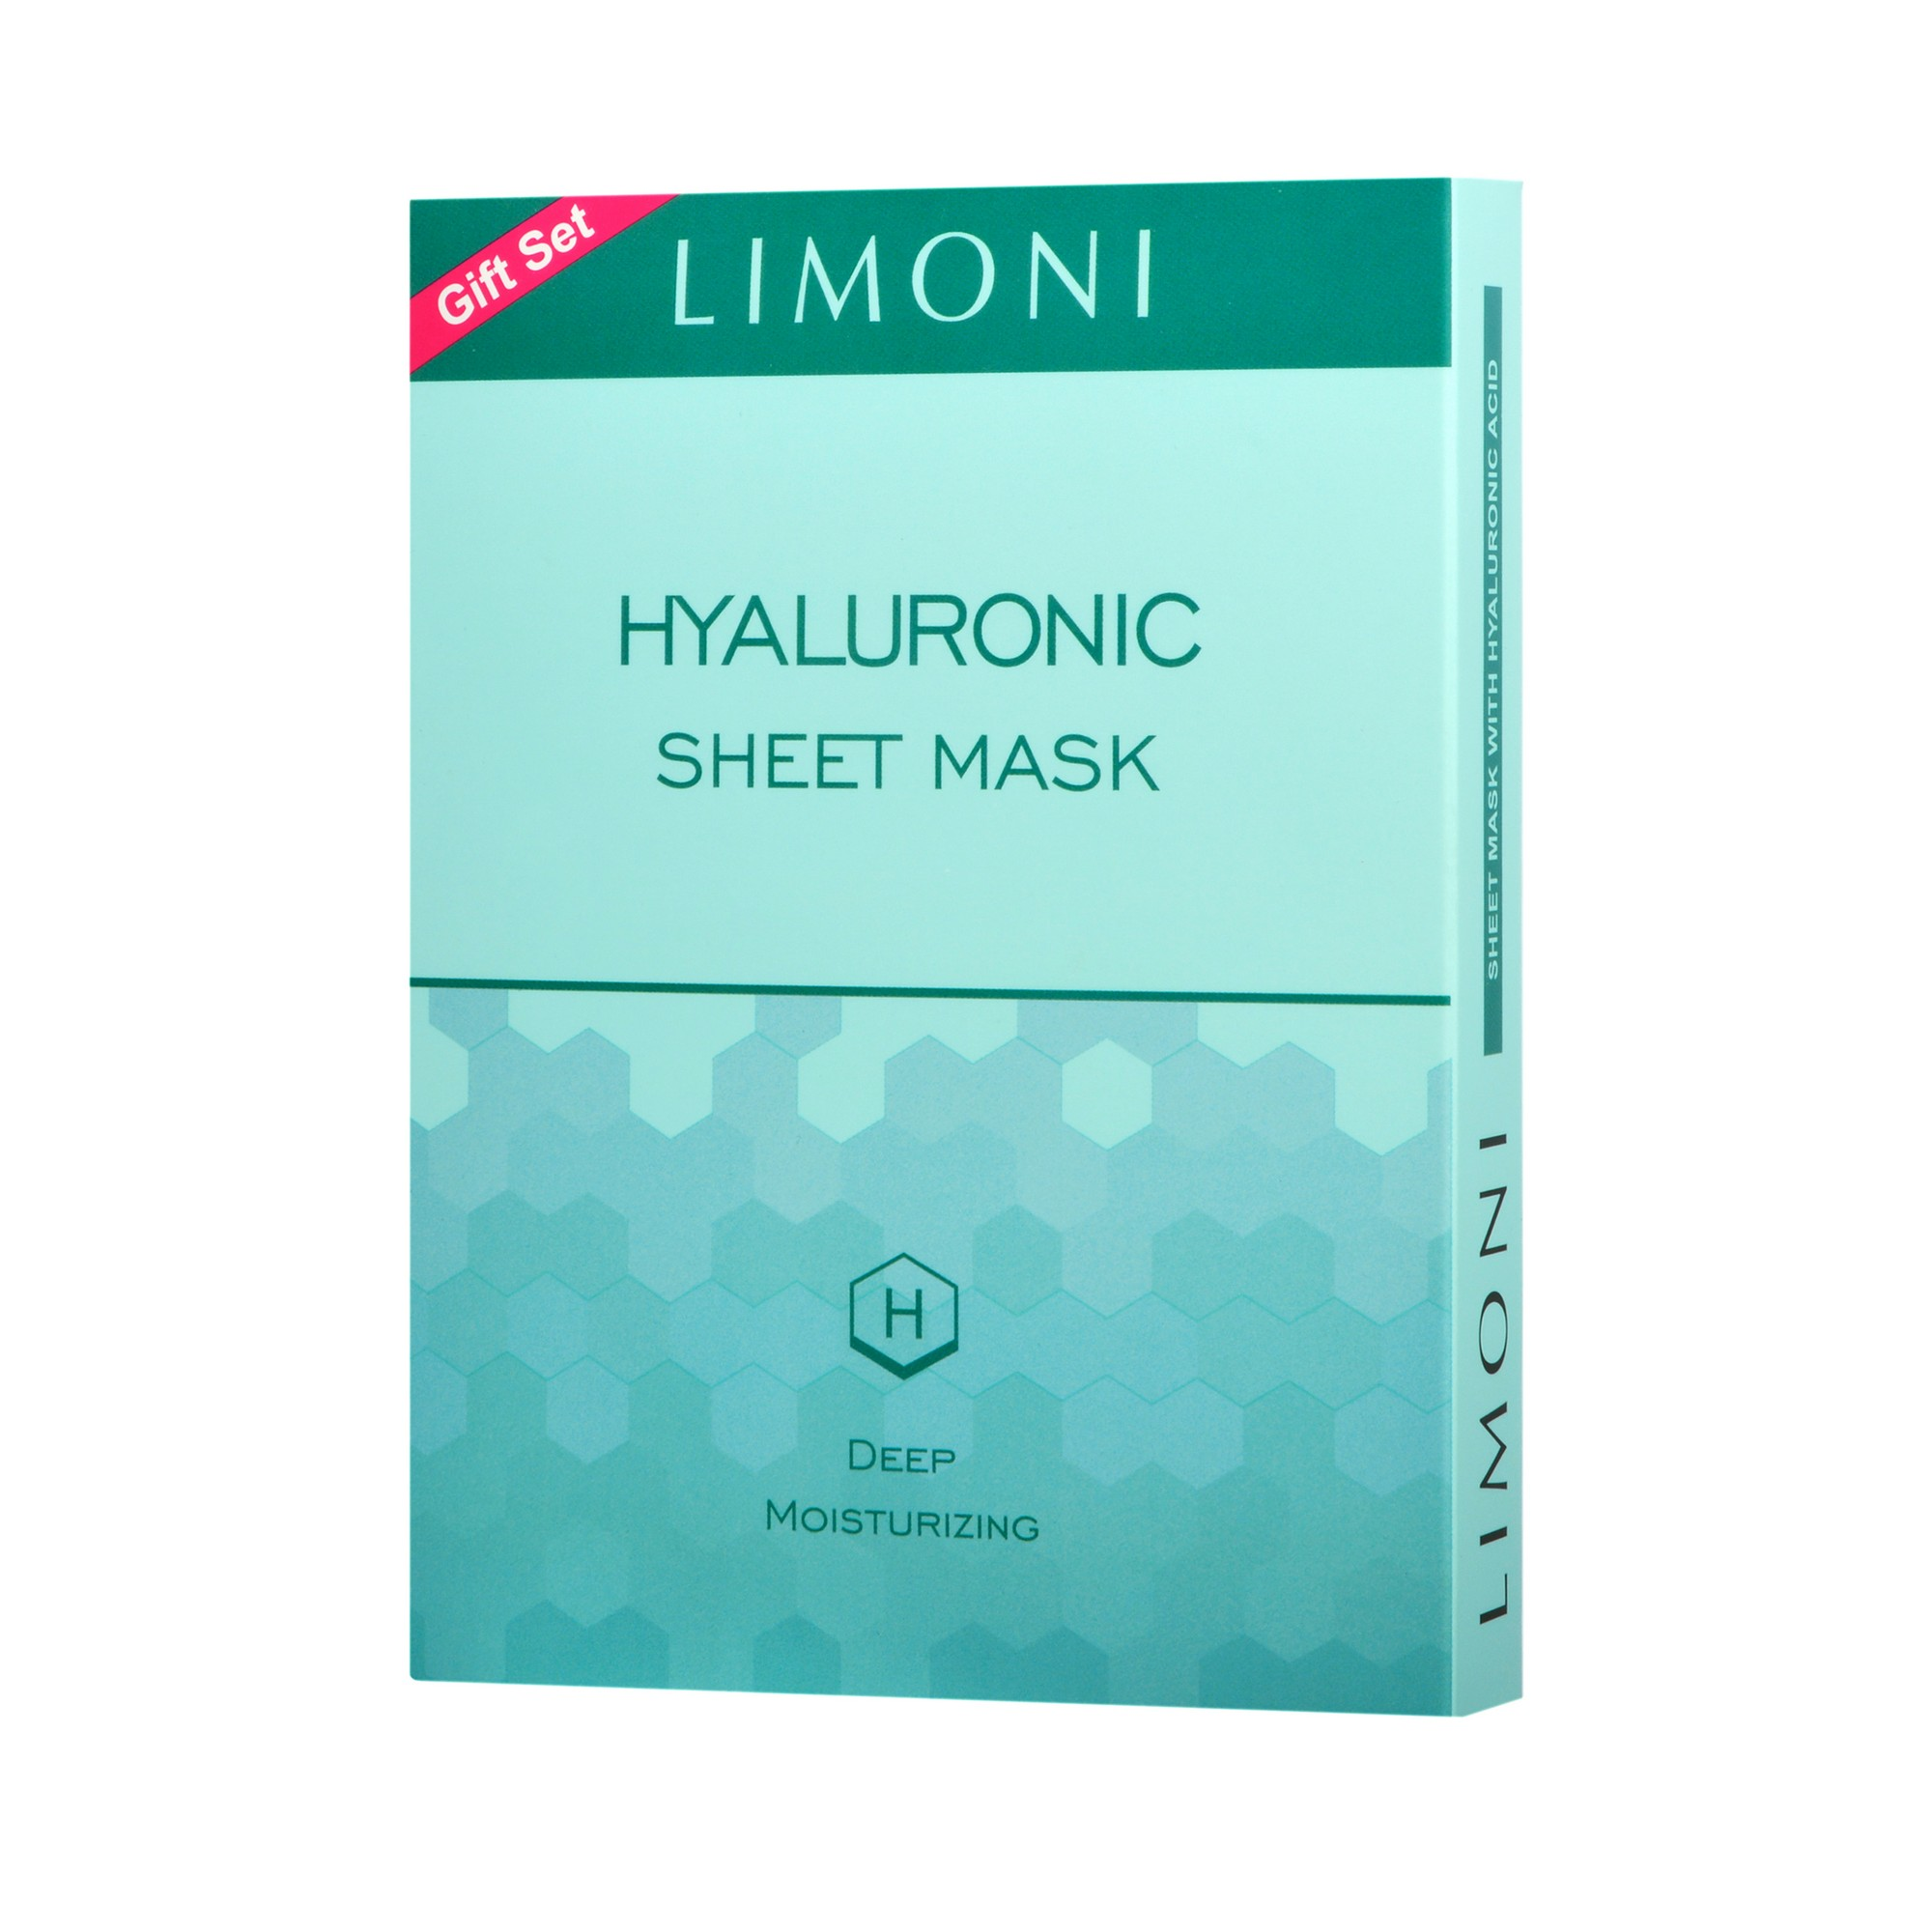 LIMONI Маска для лица суперувлажняющая с гиалуроновой кислотой / SHEET MASK WITH HYALURONIC ACID 6*20гр op7 6av3 607 1jc20 0ax1 button mask